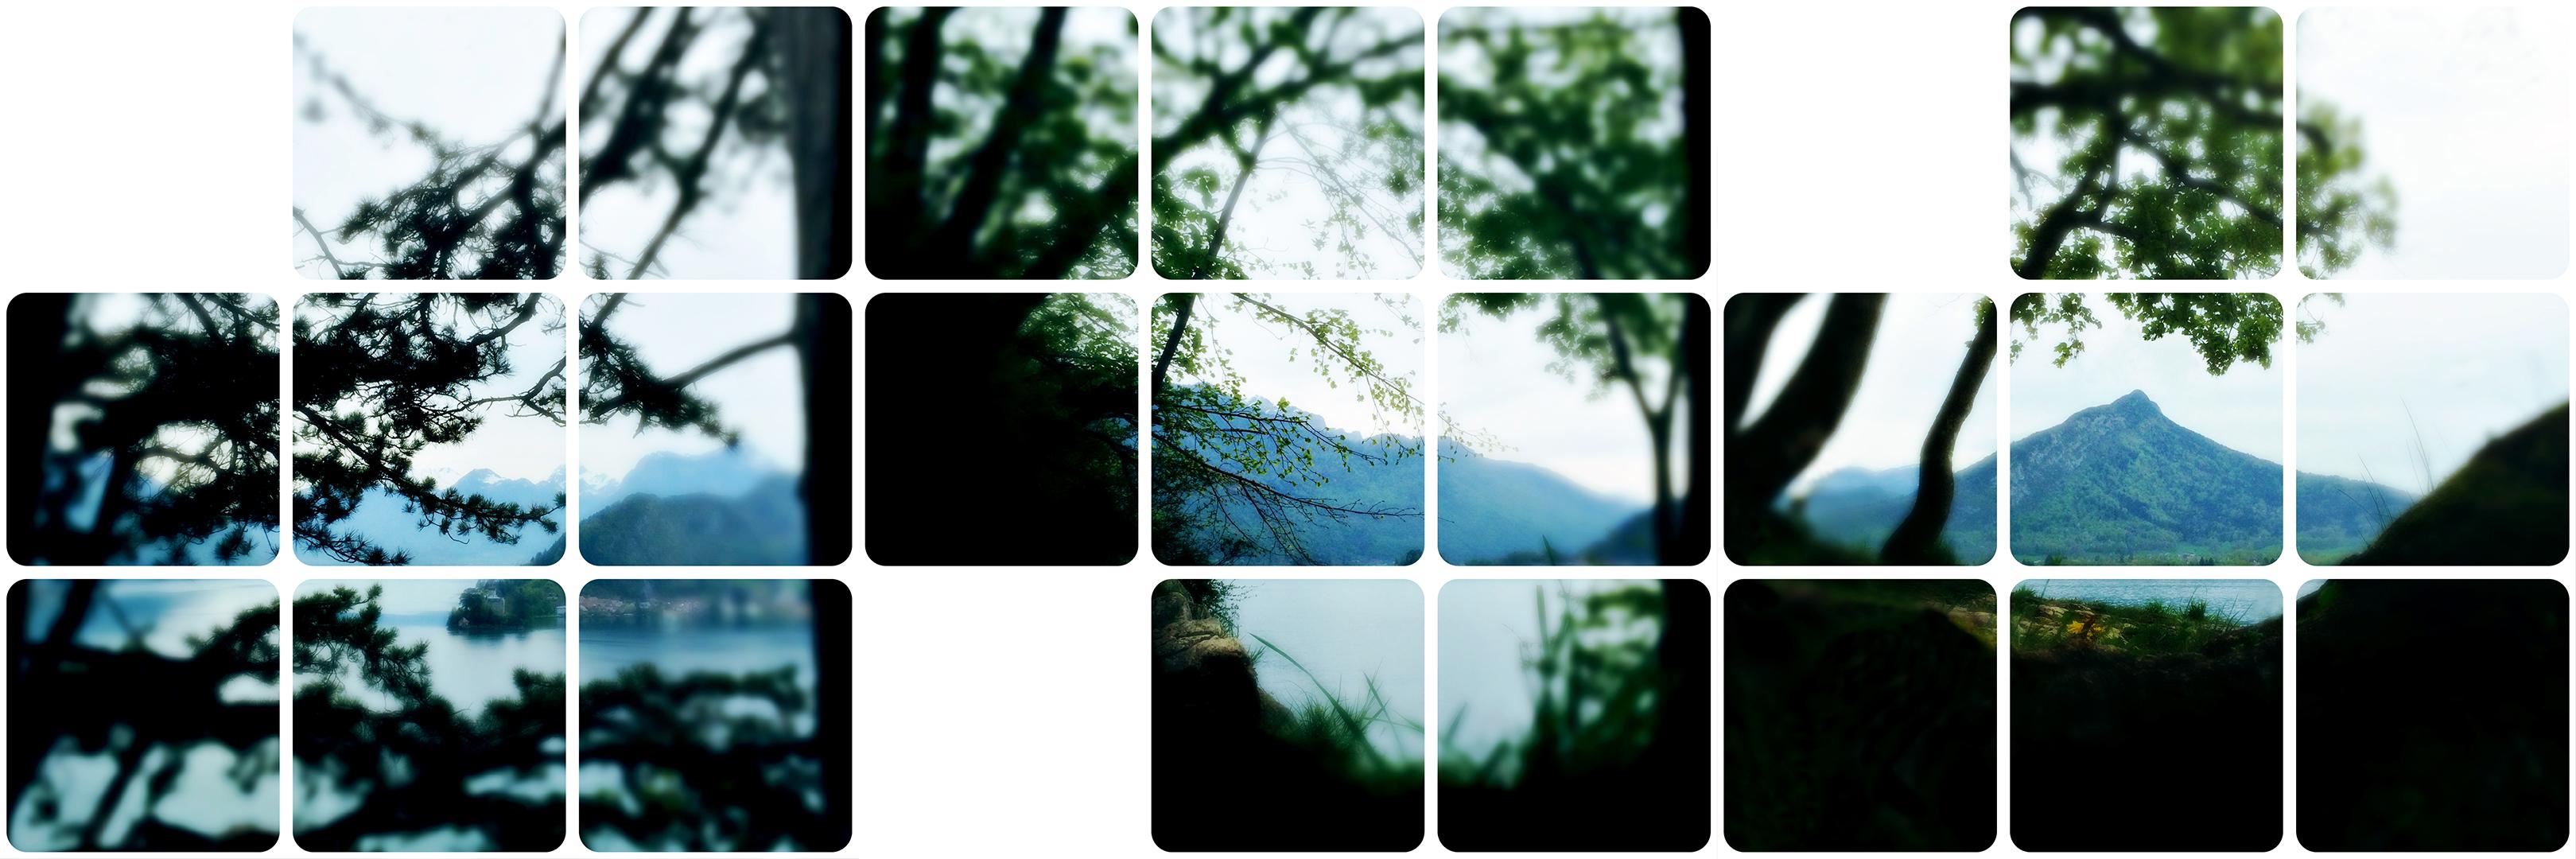 Next horizon 01